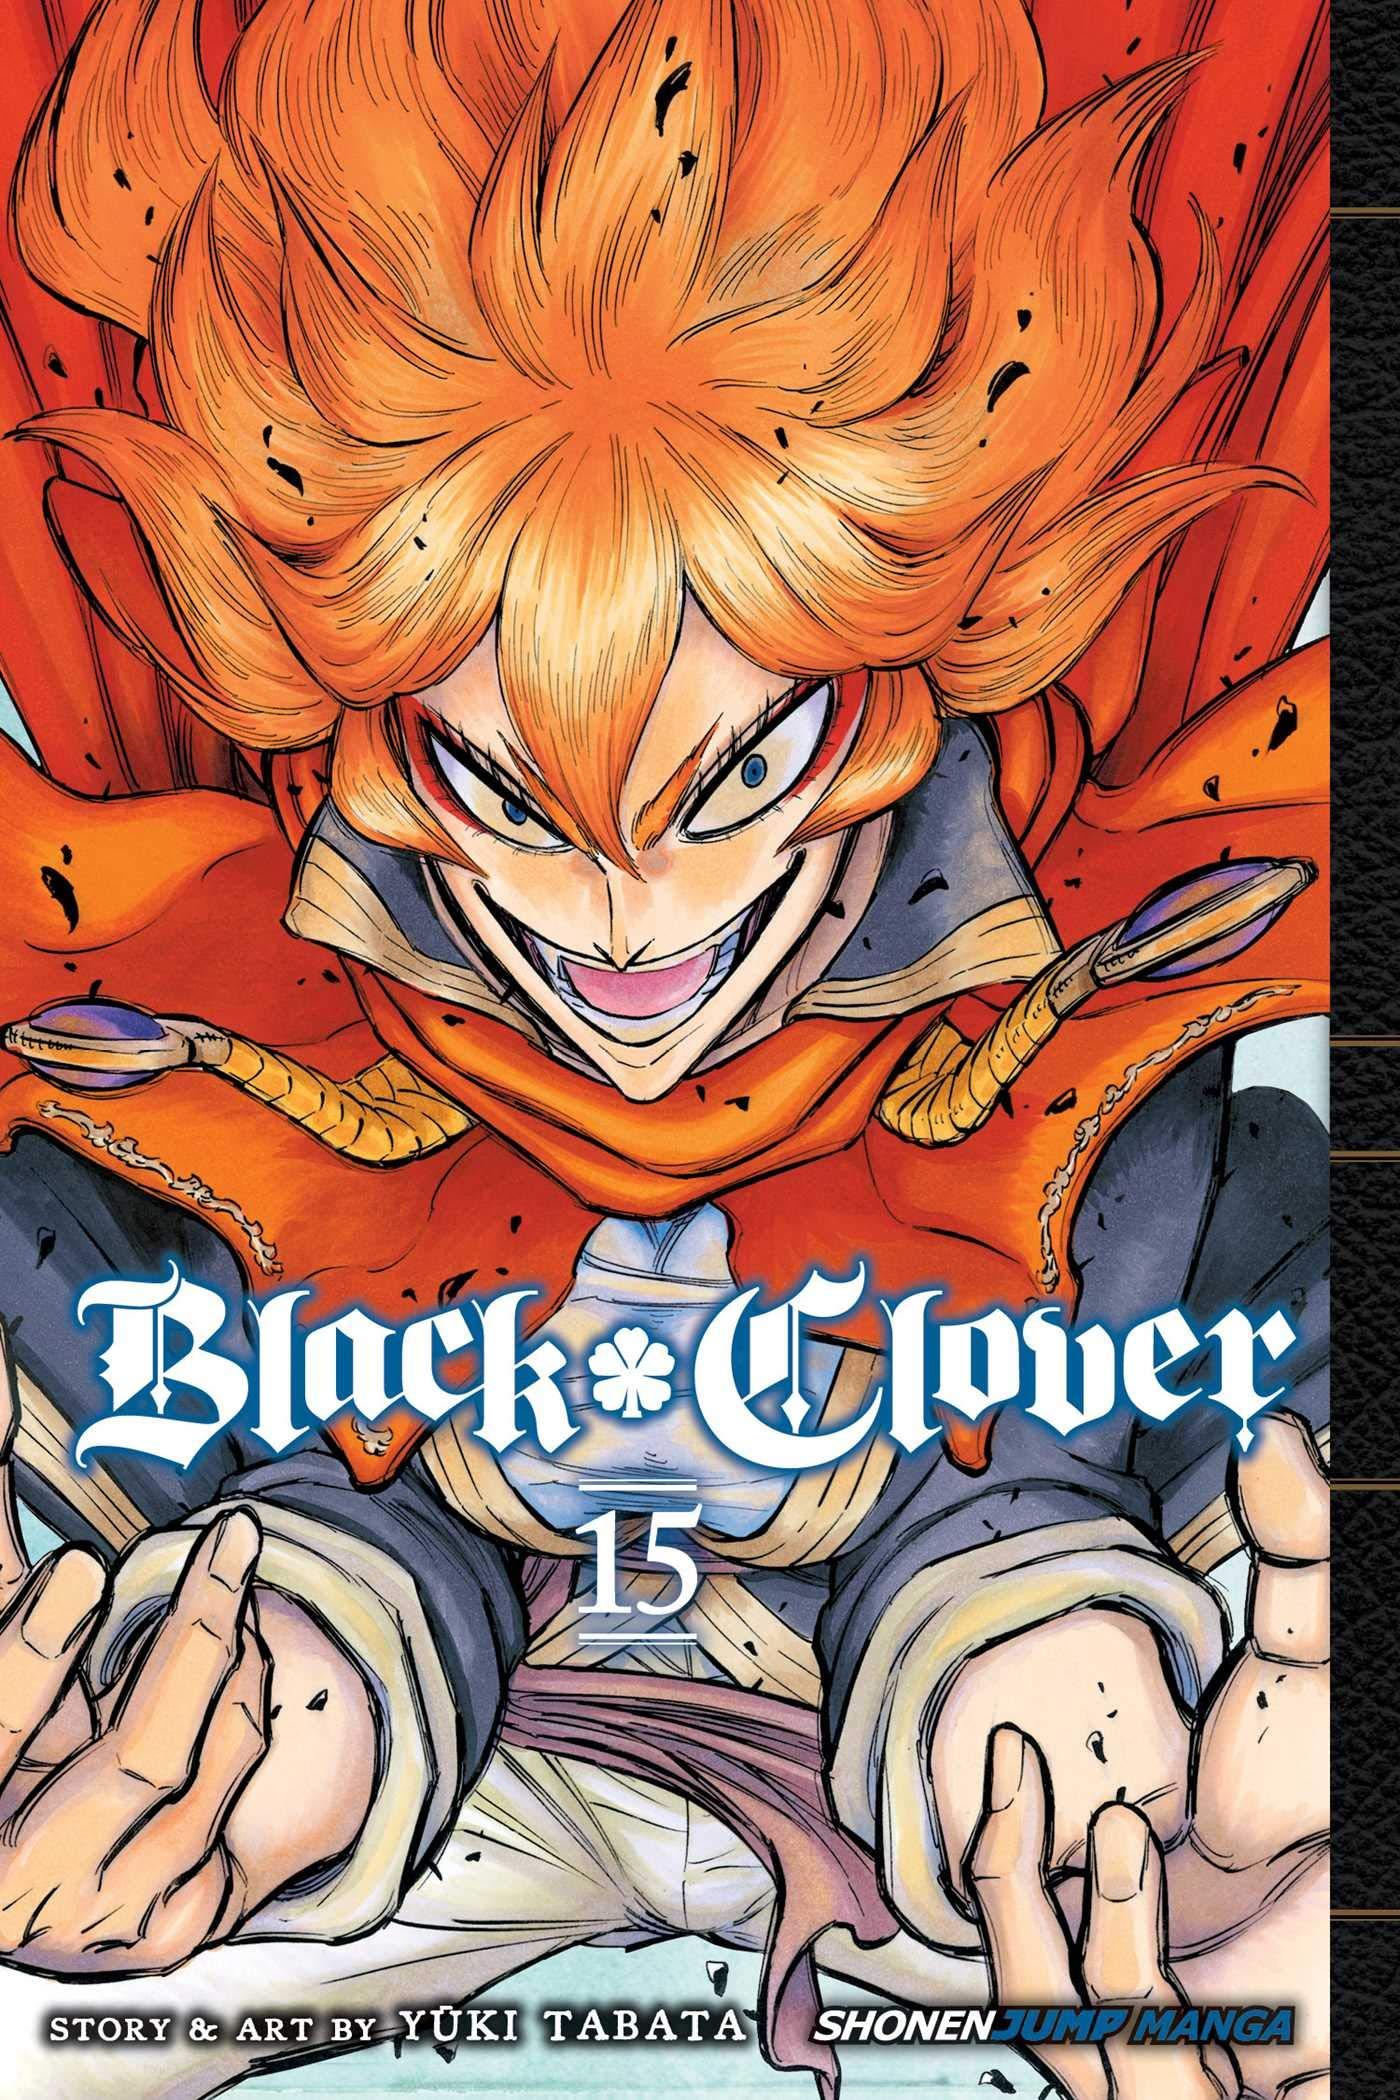 Black Clover Vol. 15